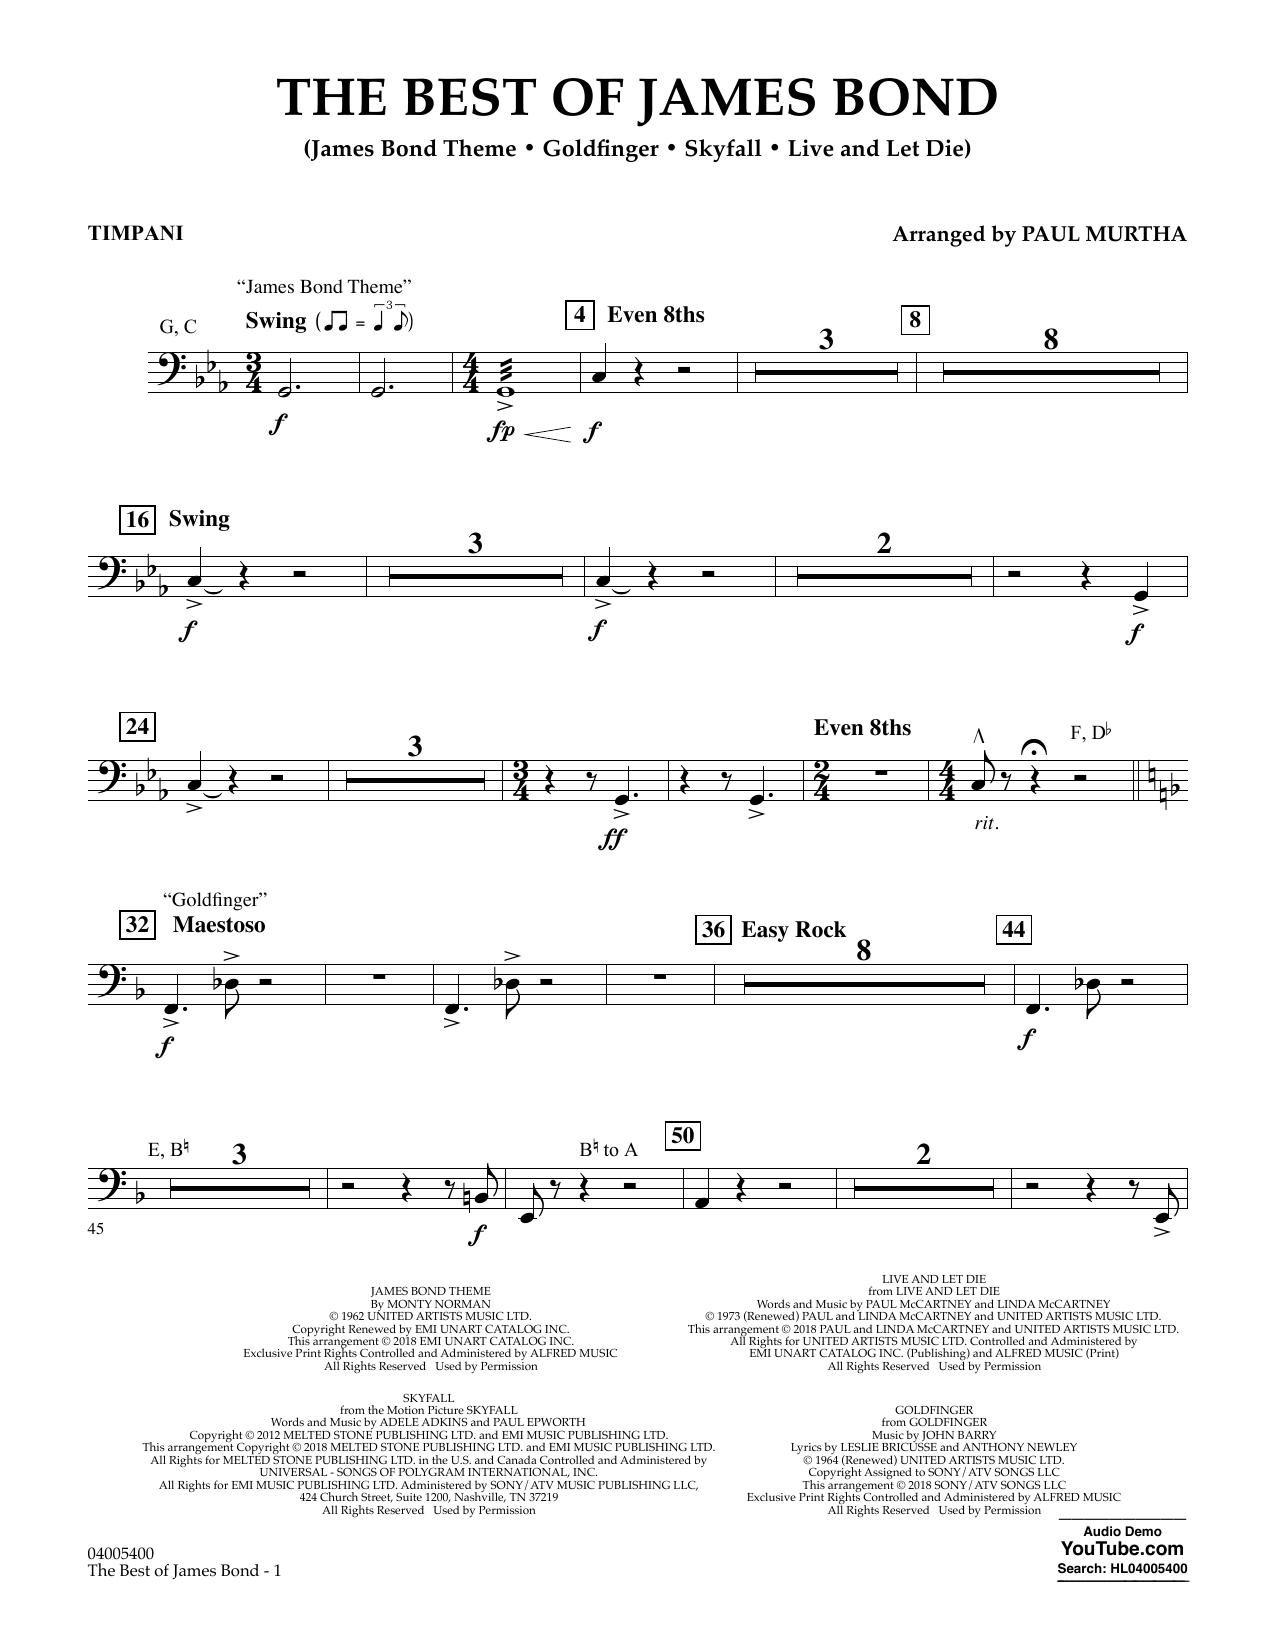 The Best of James Bond - Timpani (Concert Band)